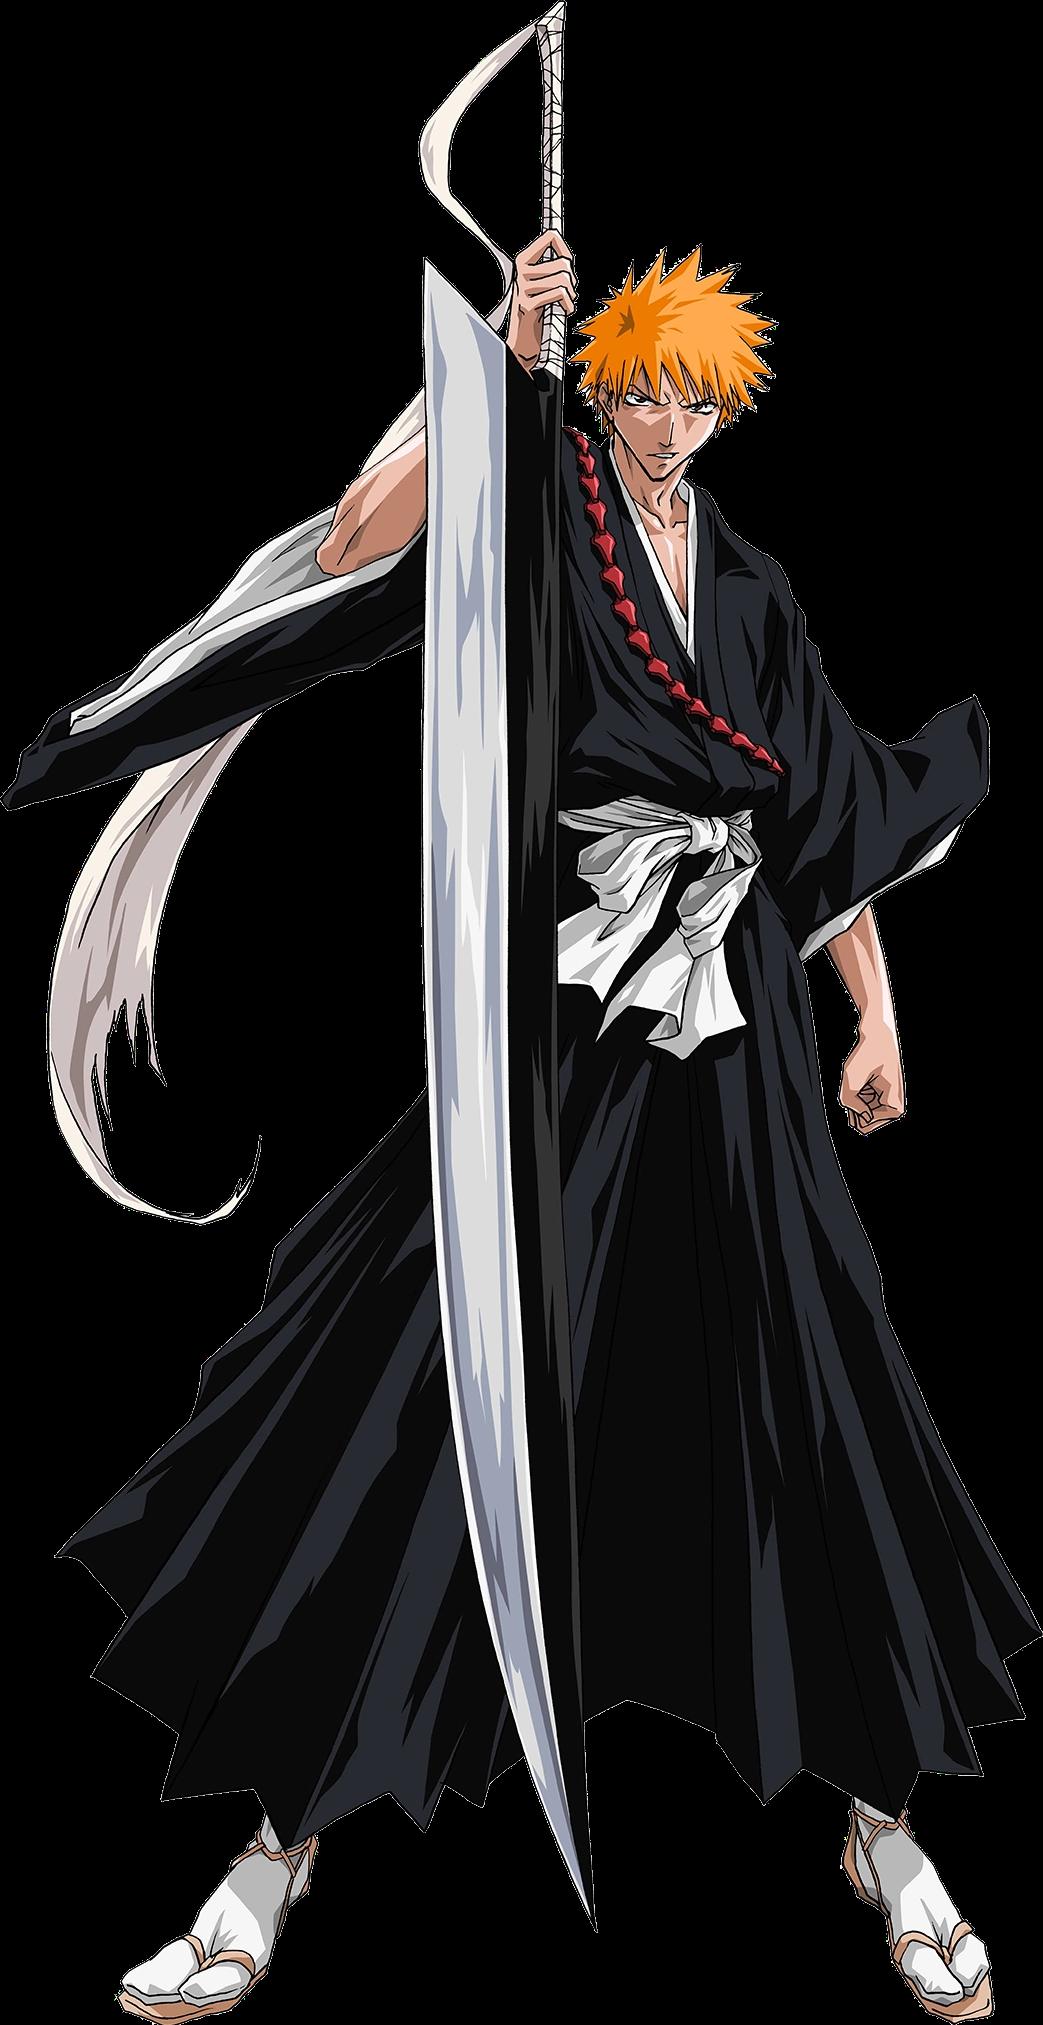 Ichigo (Super Smash Flash 2) | McLeodGaming Wiki | FANDOM